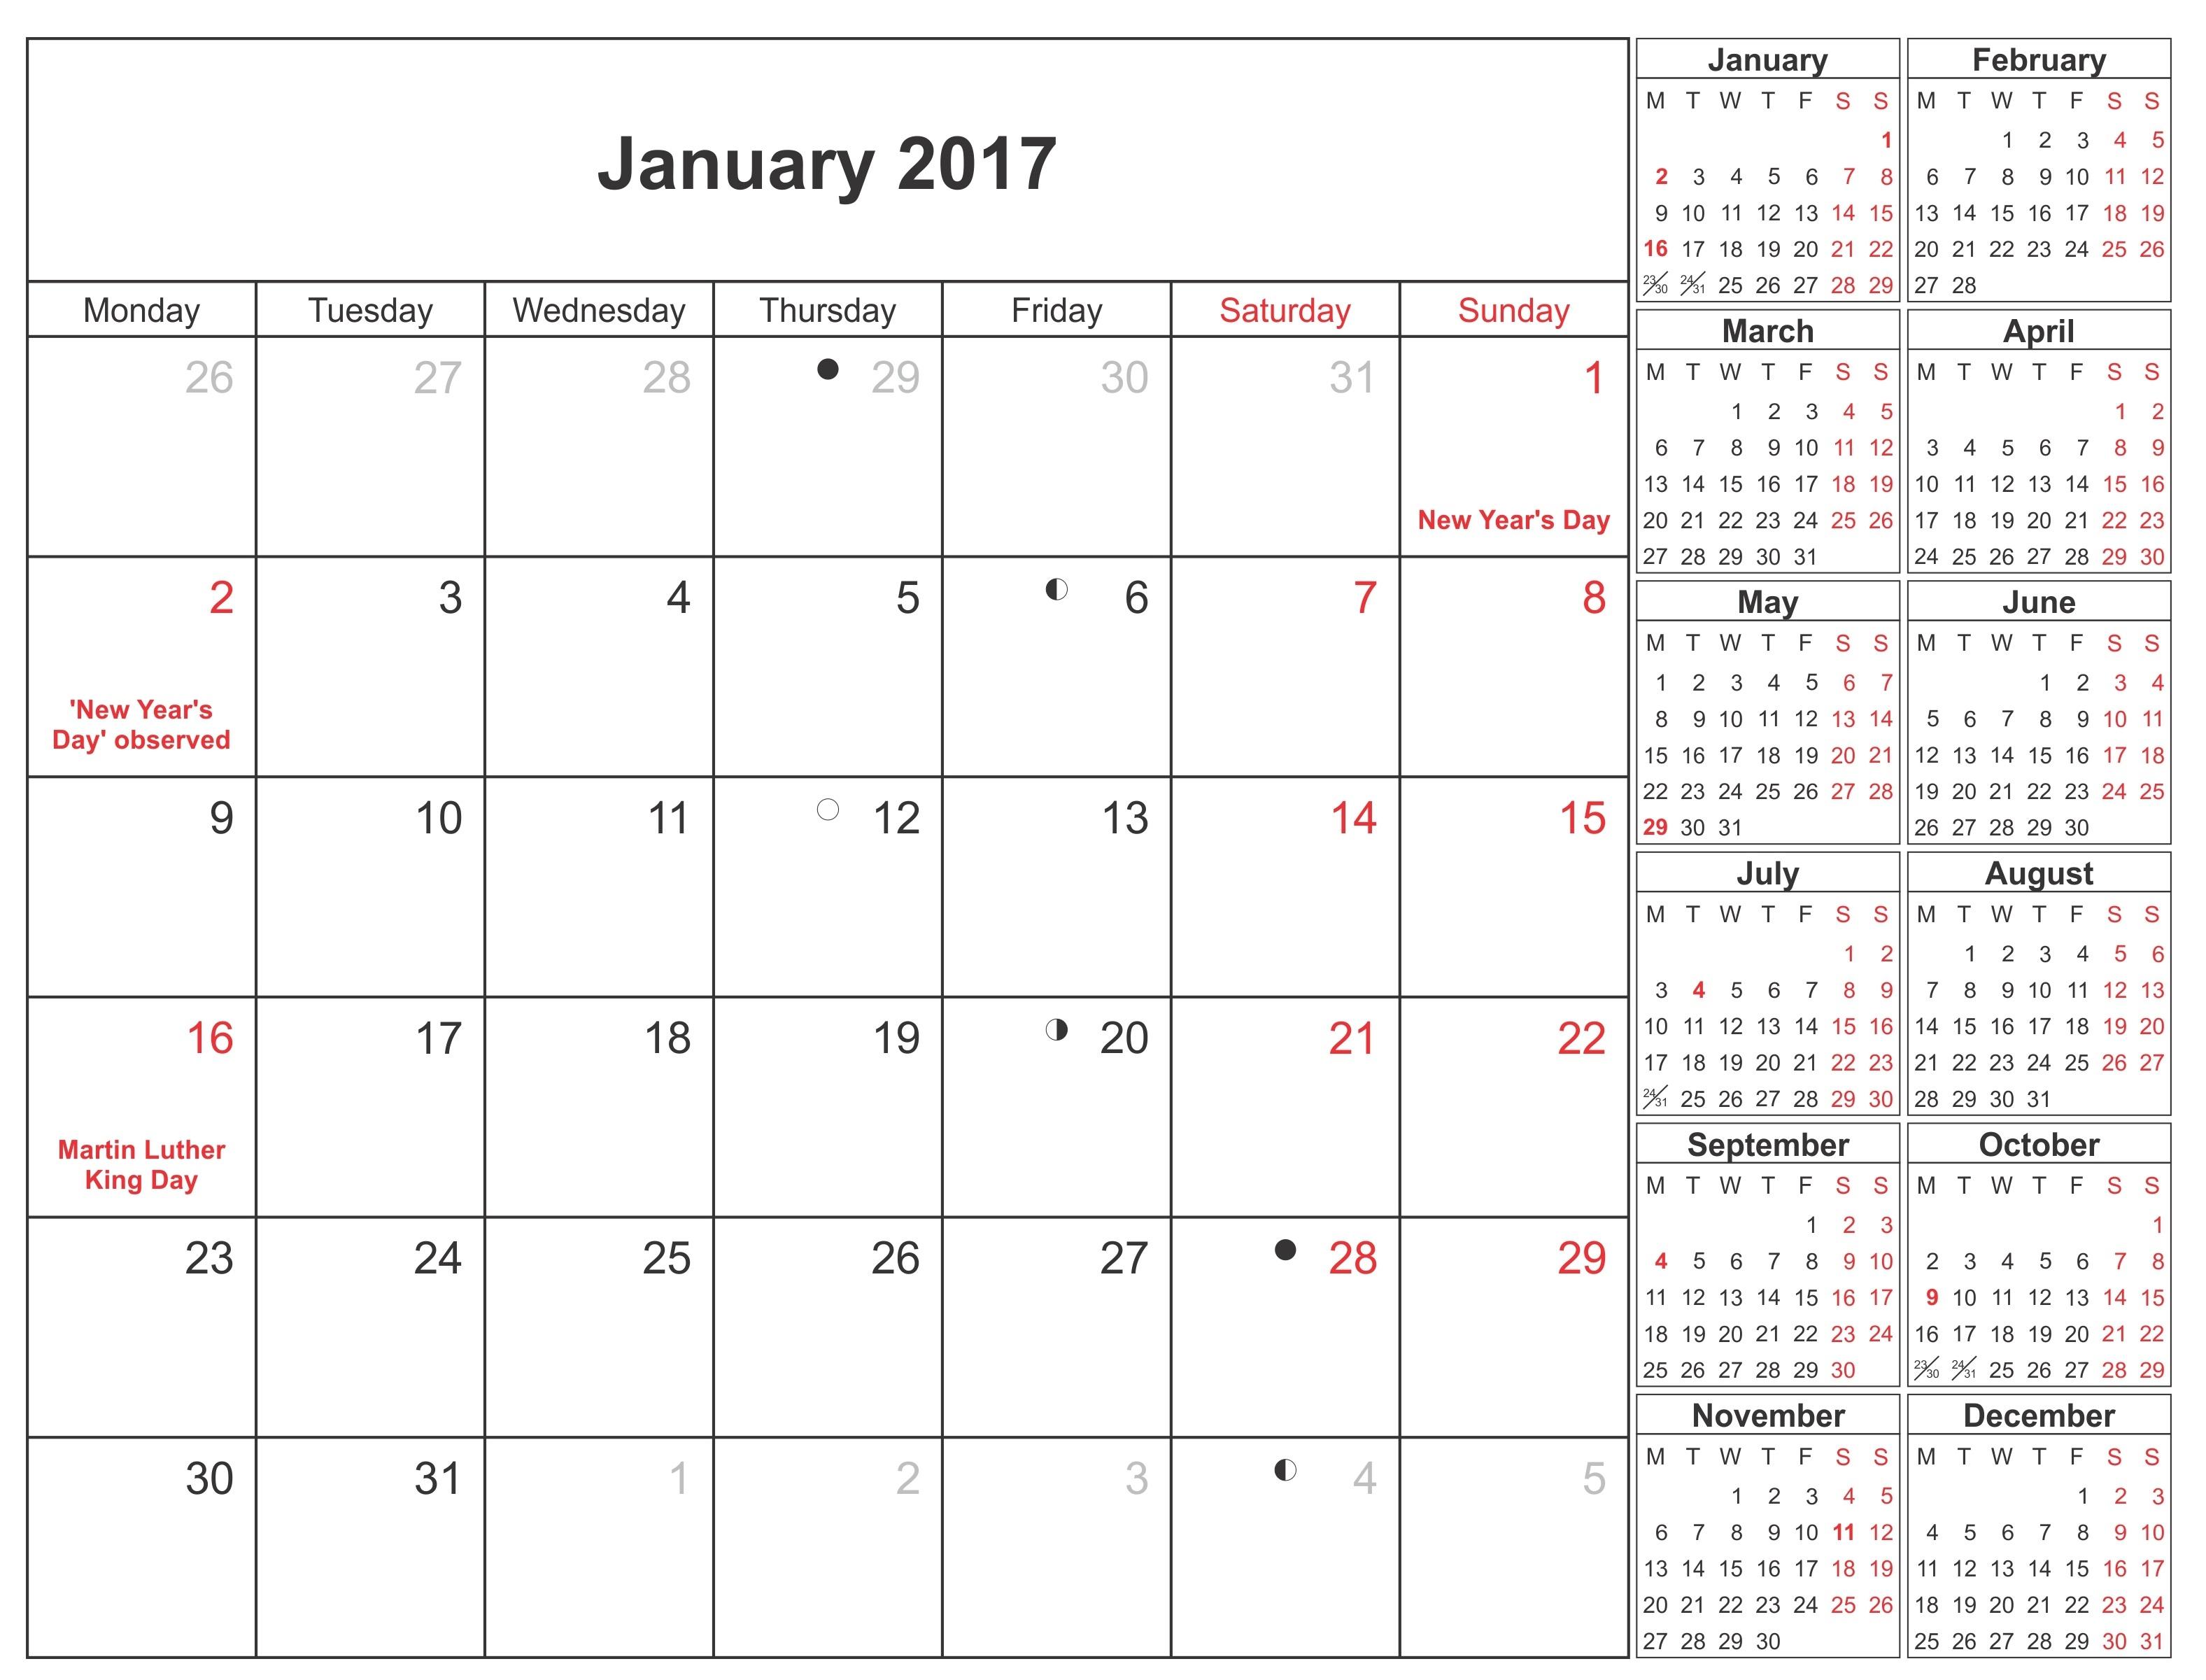 January 2017 Moon Phase Calendar Moon Schedule Free Printable 89uj